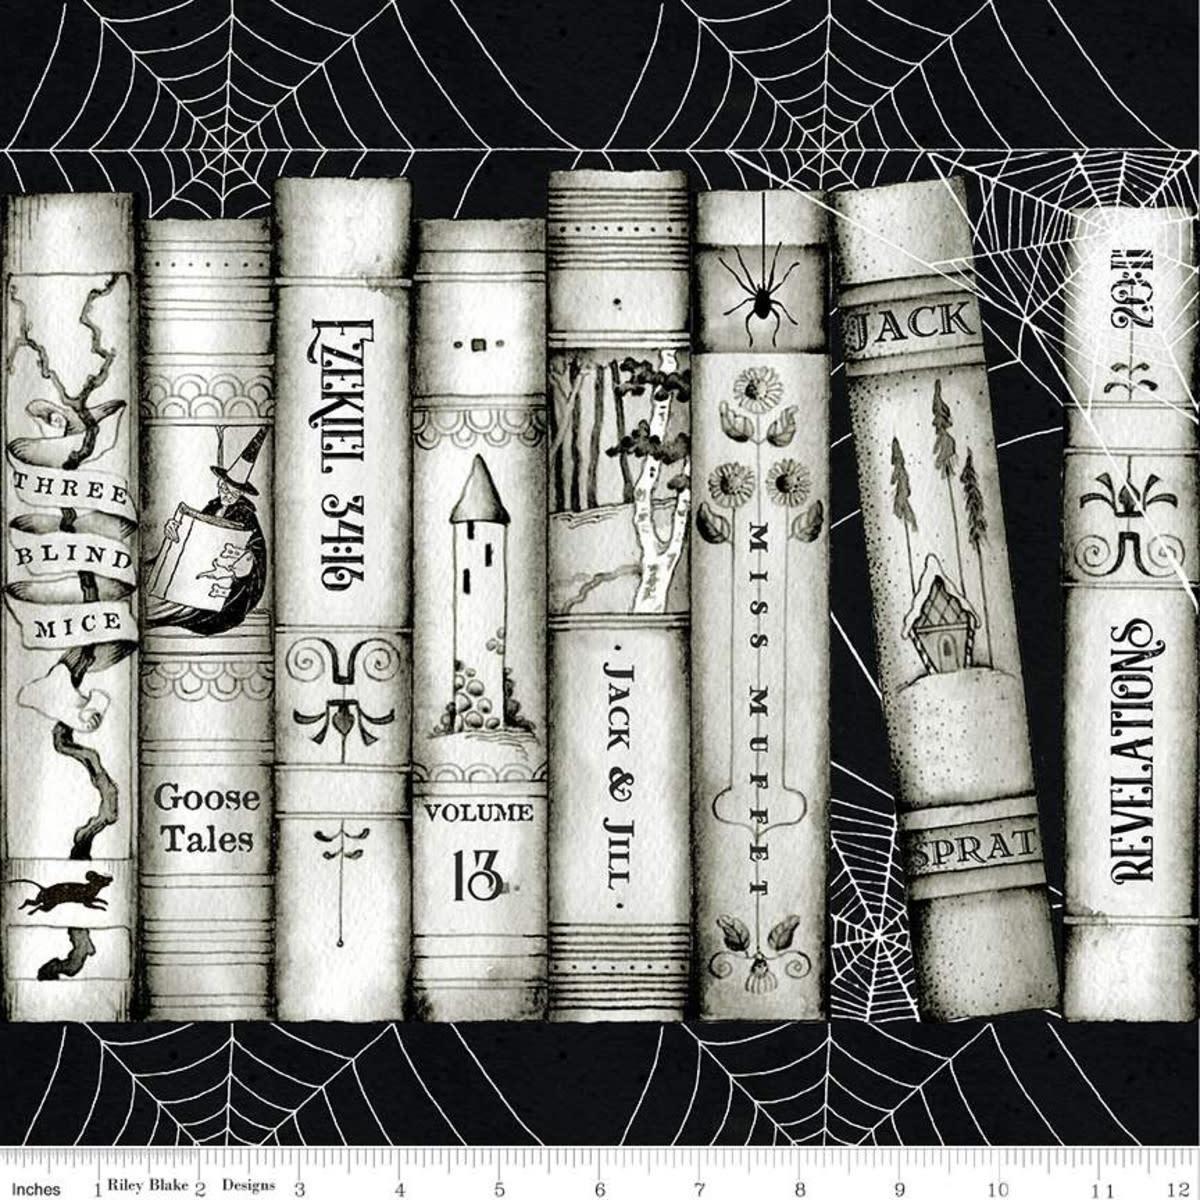 RILEY BLAKE DESIGNS Goose Tales, Book Spines Border Stripe, per cm or $20/m Halloween